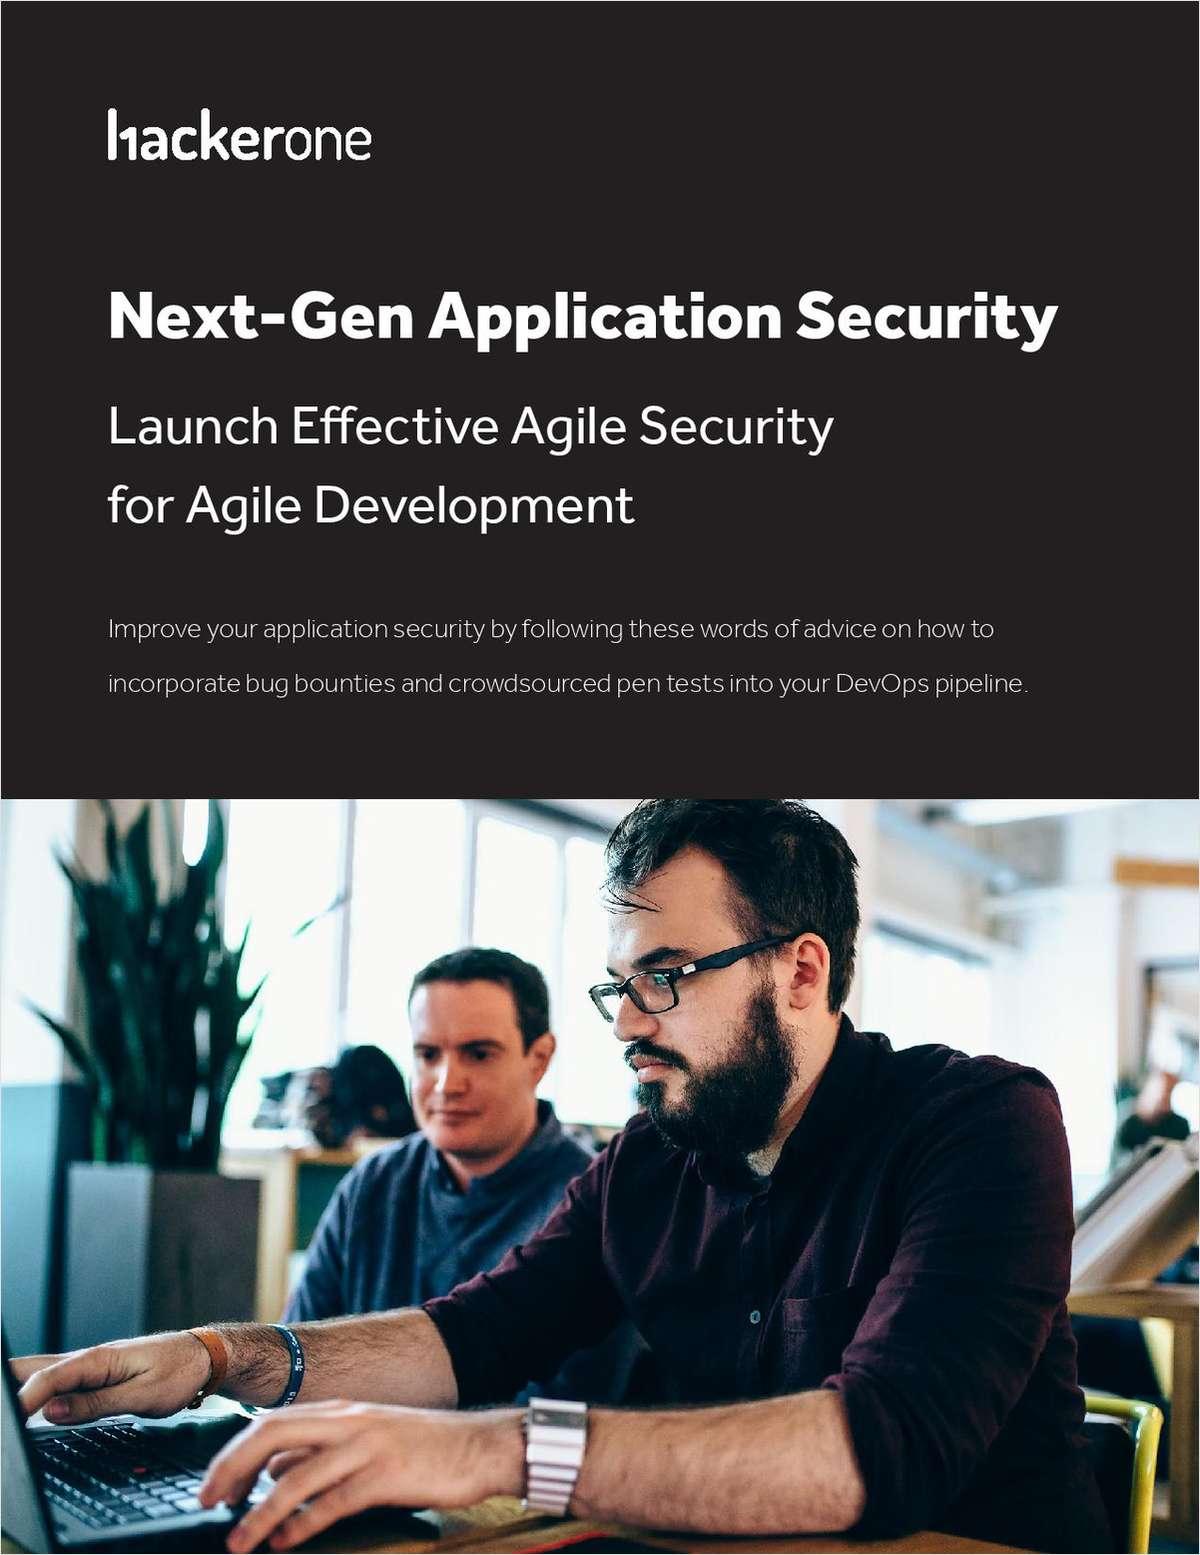 Next-Gen Application Security: Launch Effective Agile Security for Agile Development